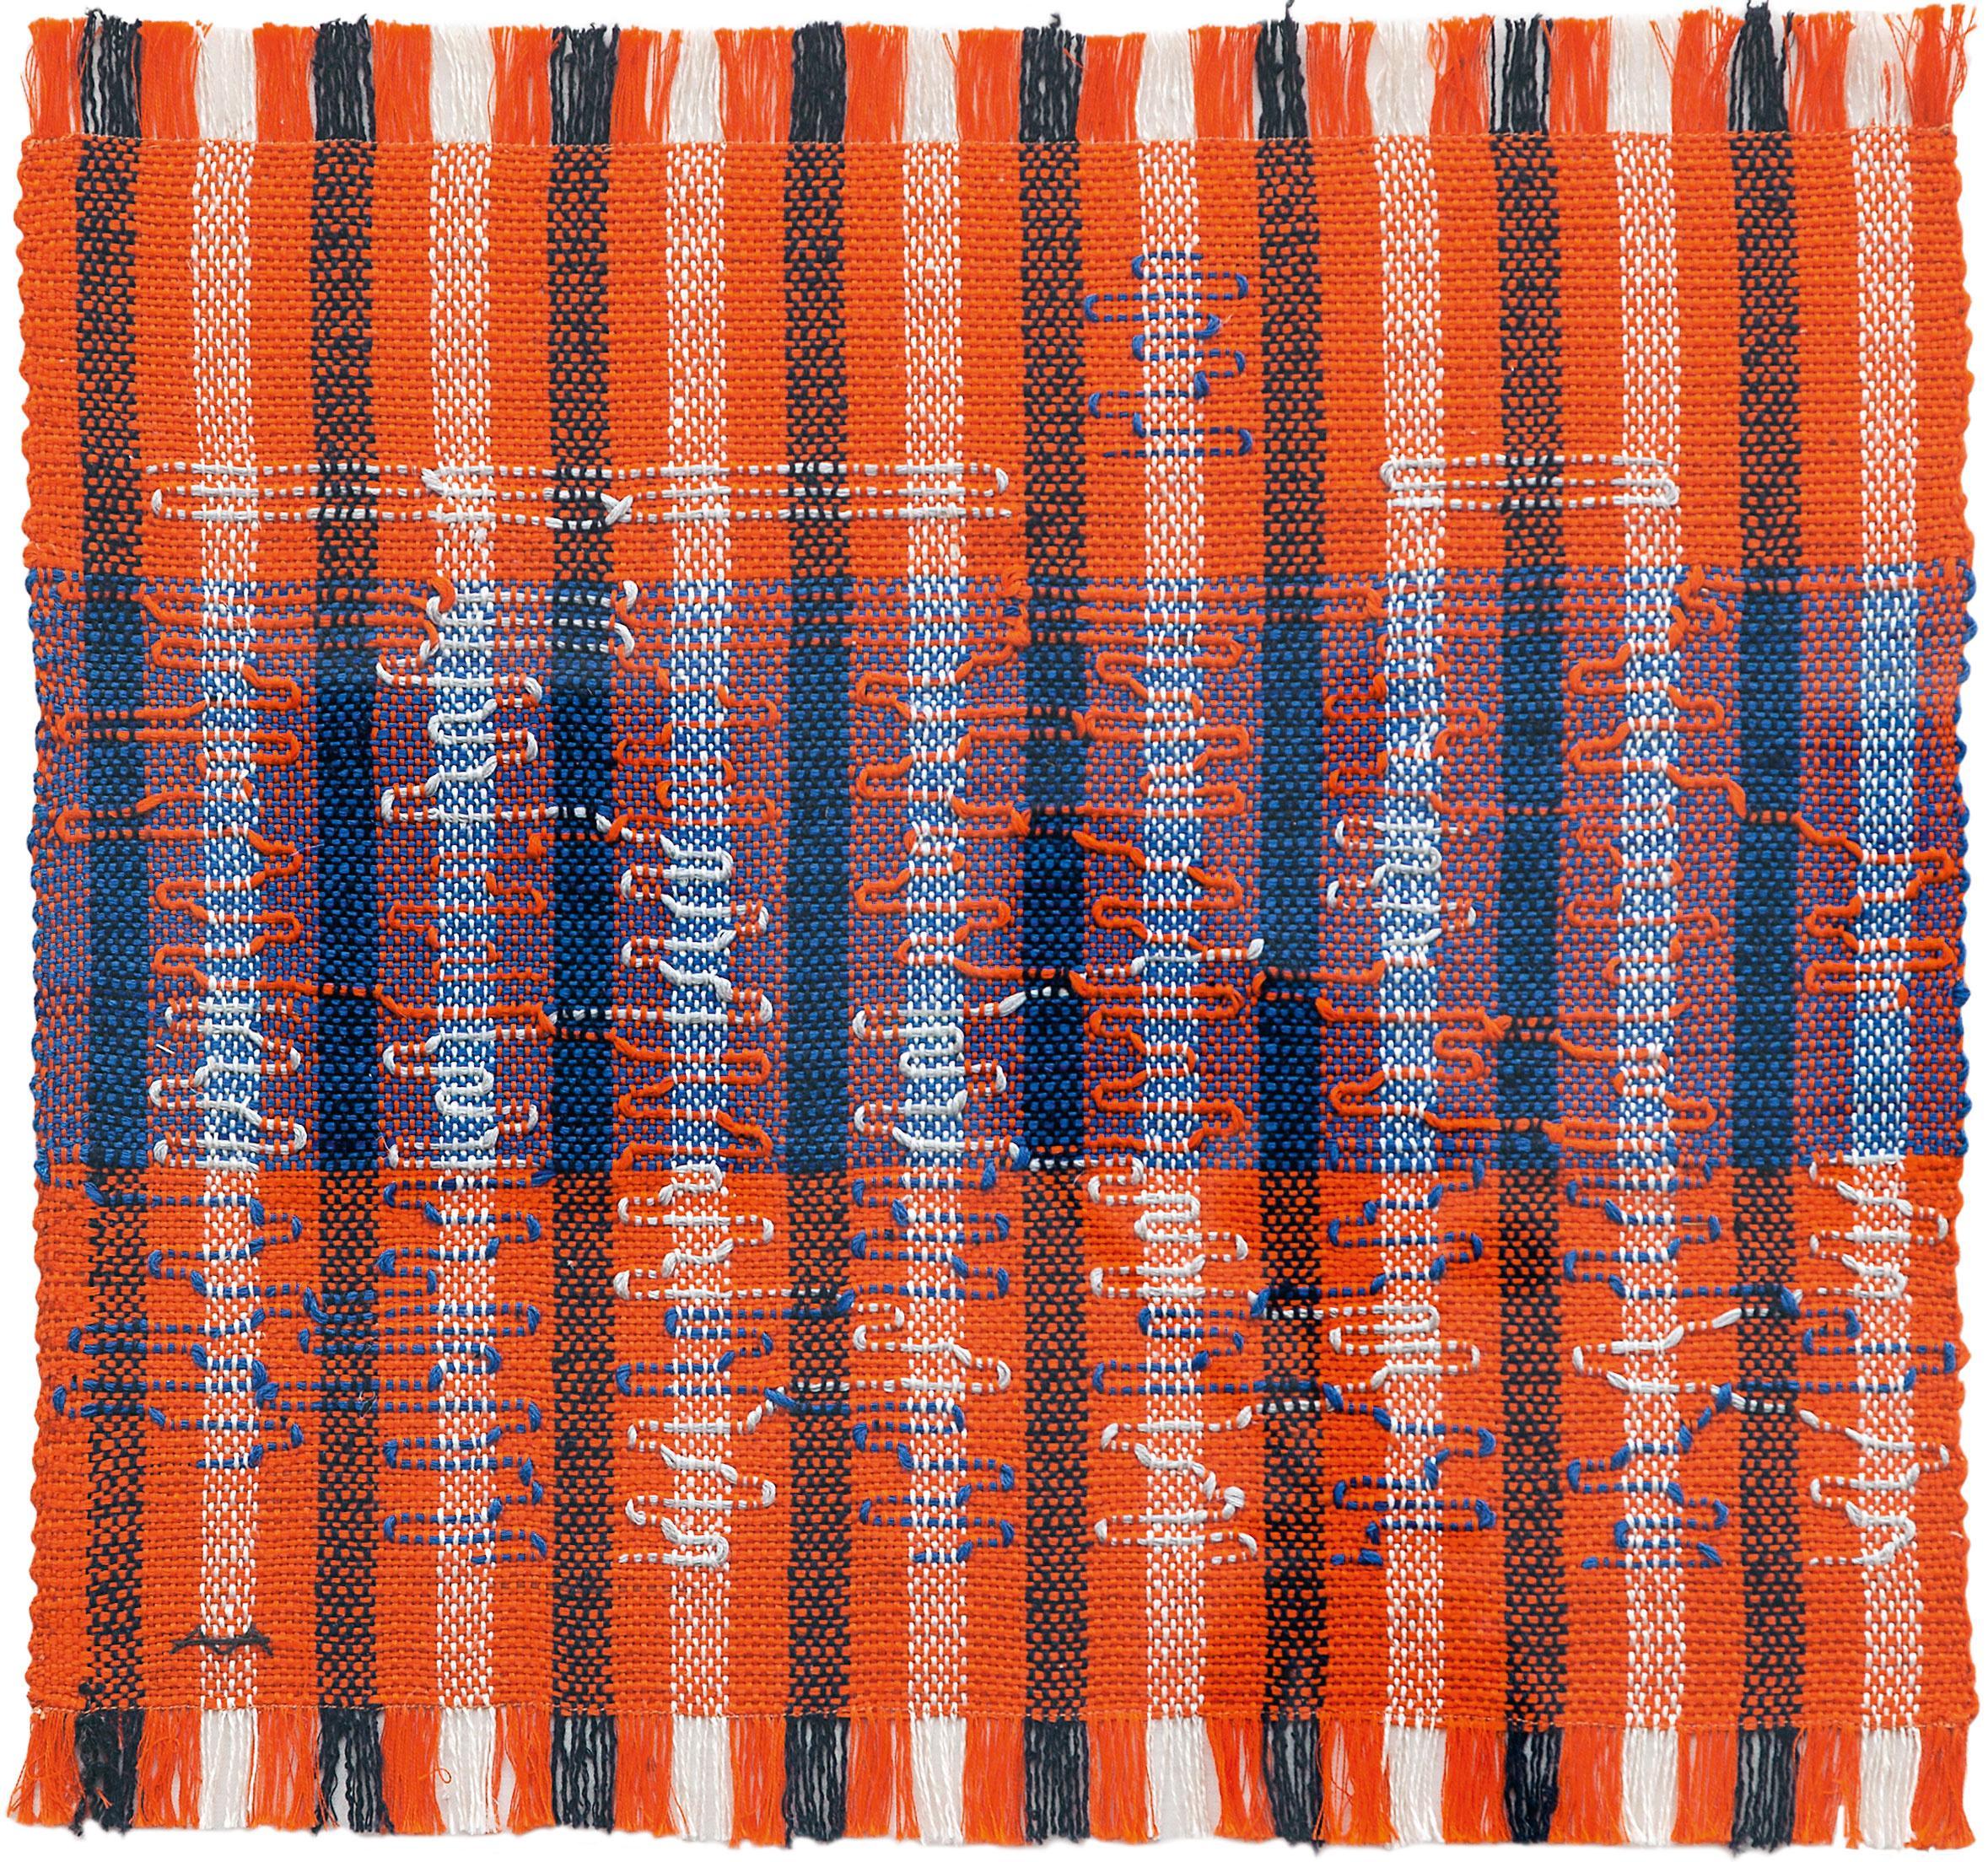 Anni Albers's Intersecting: geometric language